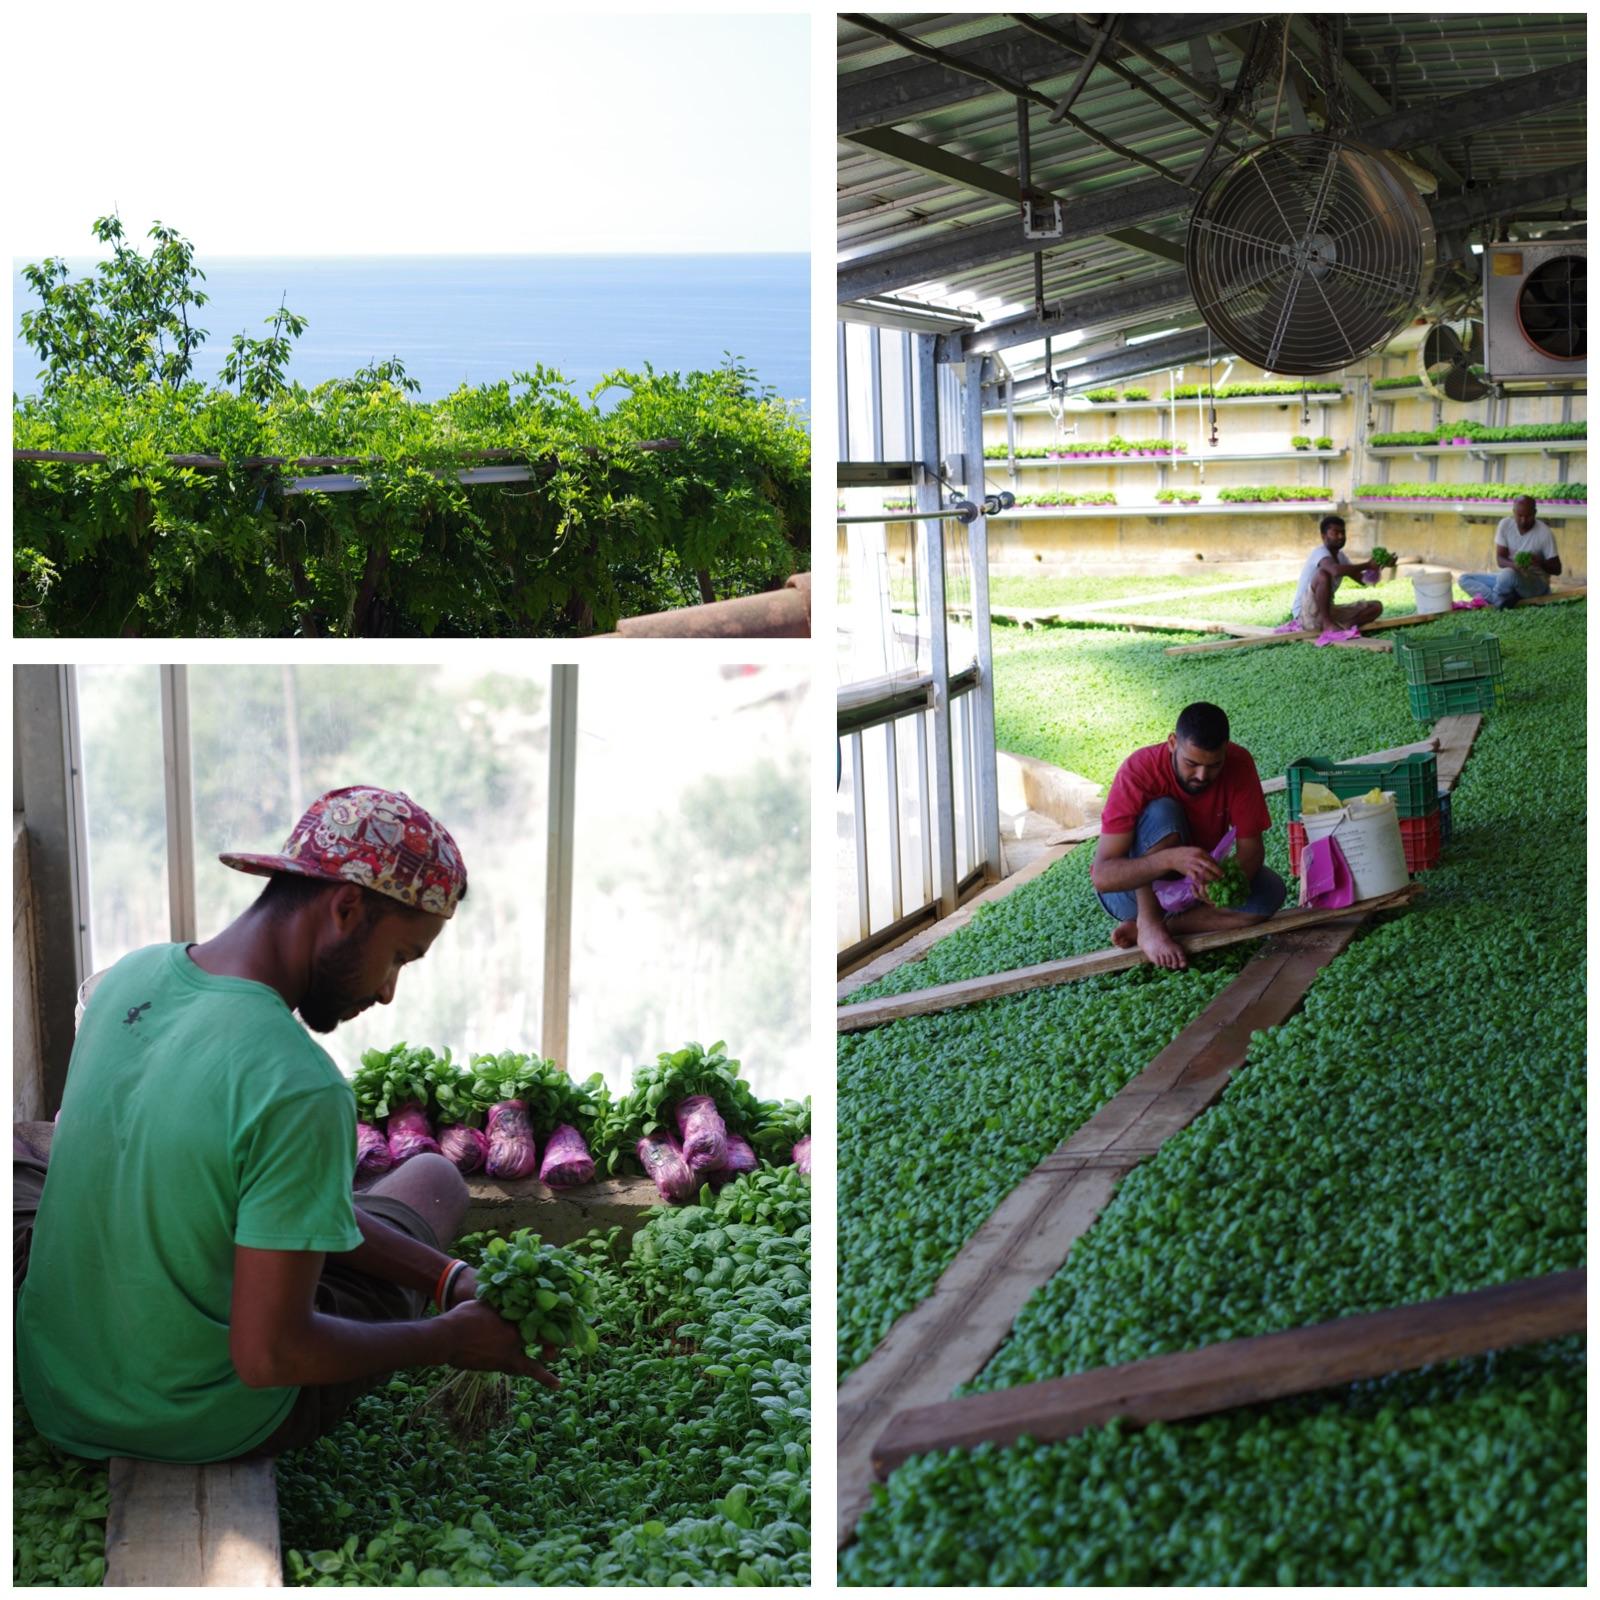 pesto sauce: pesto plantation at Calgagno Paolo